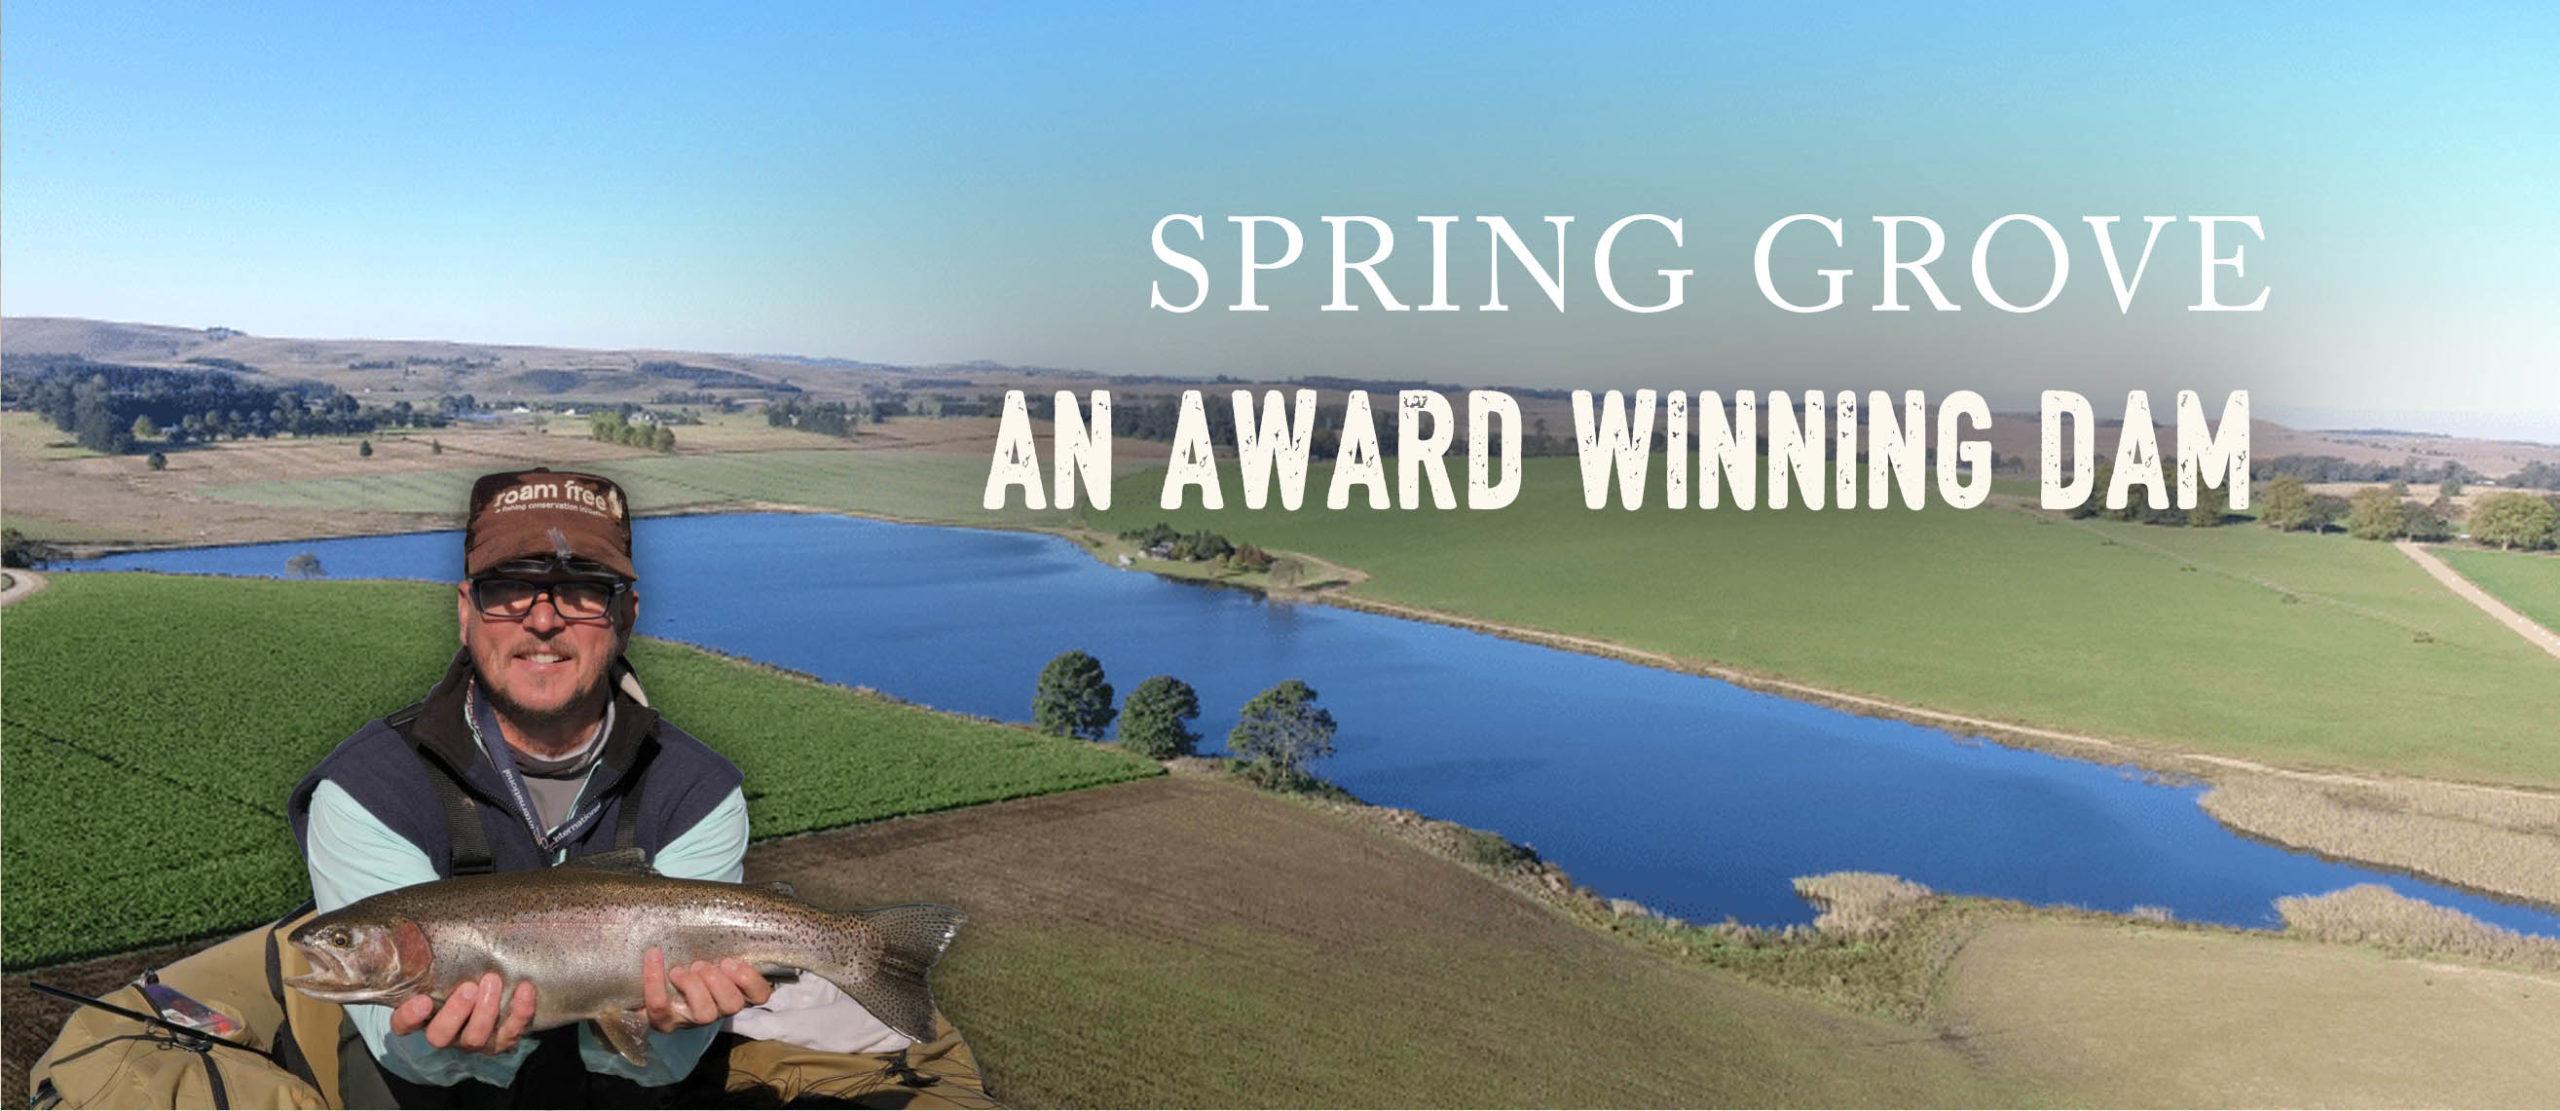 Spring Grove Farm